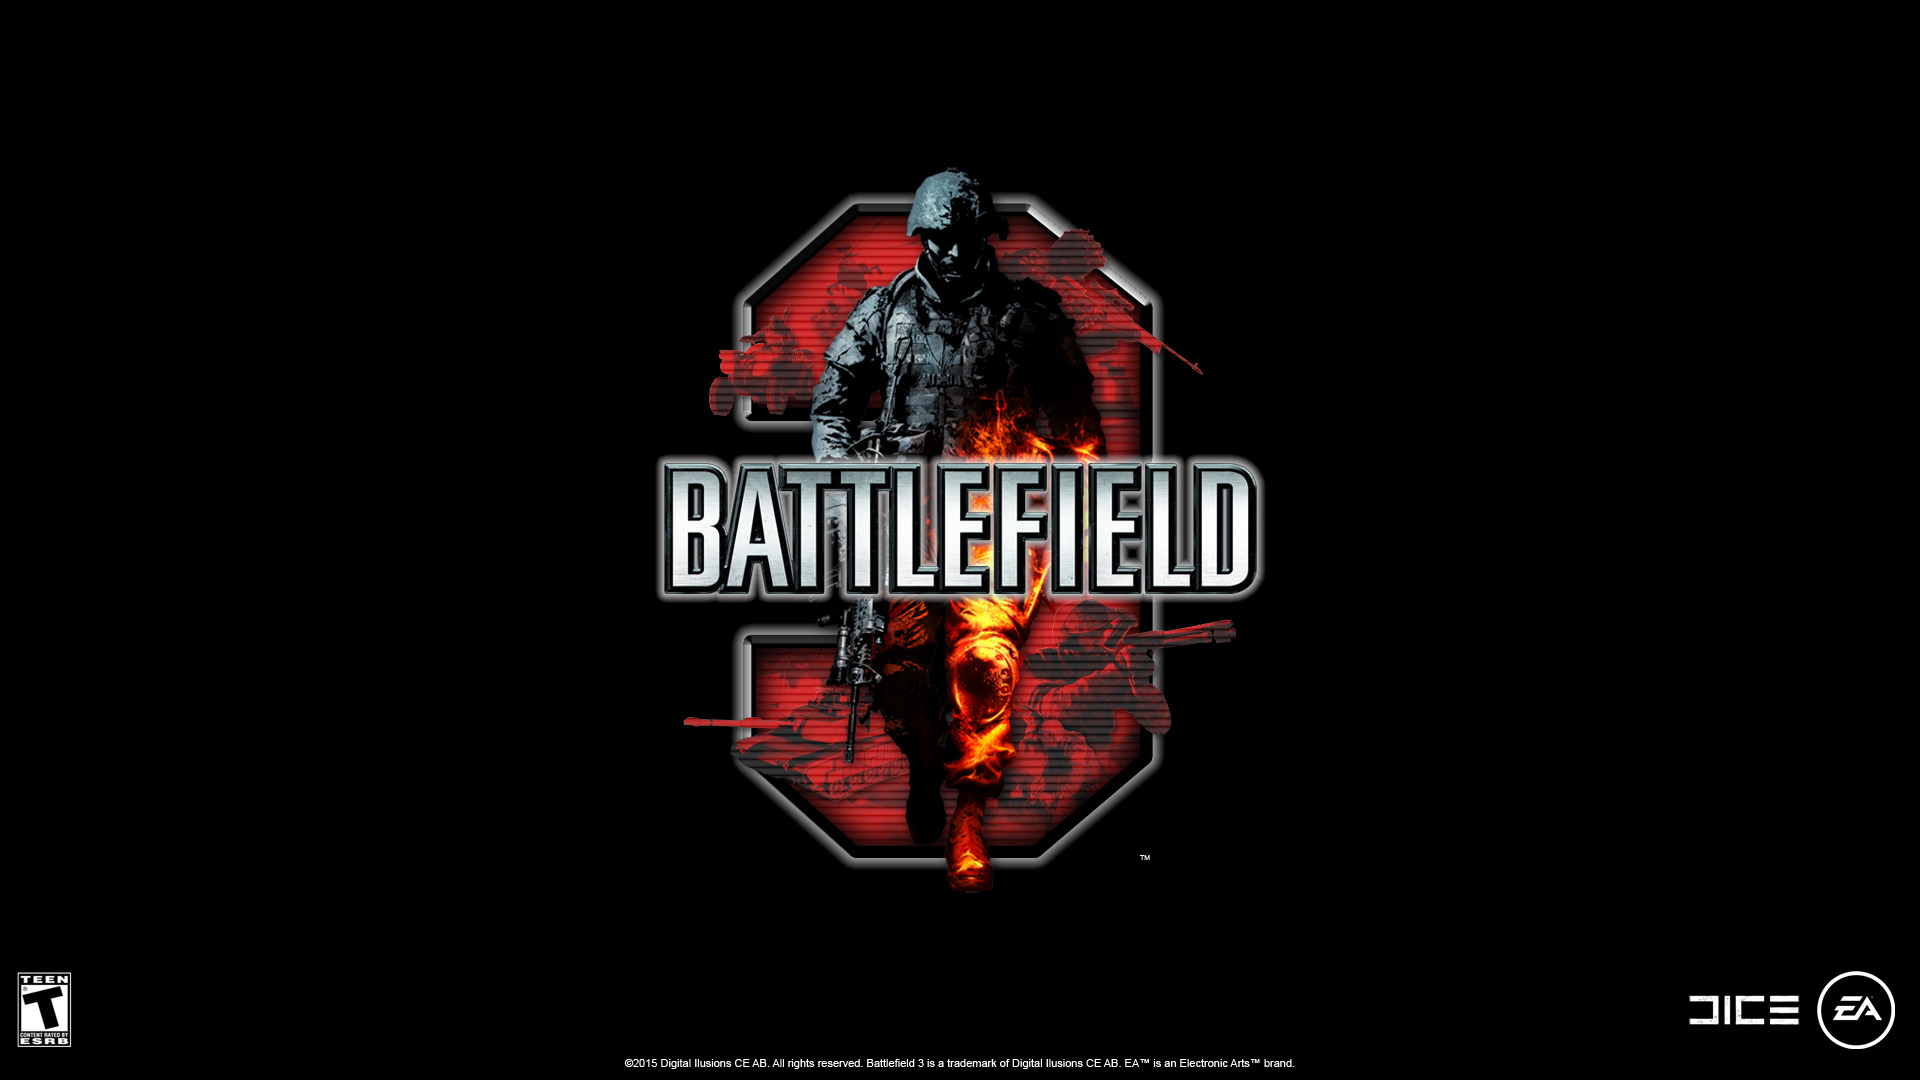 Battlefield 3 muestra su primer trailer gameplay [YUPI!]